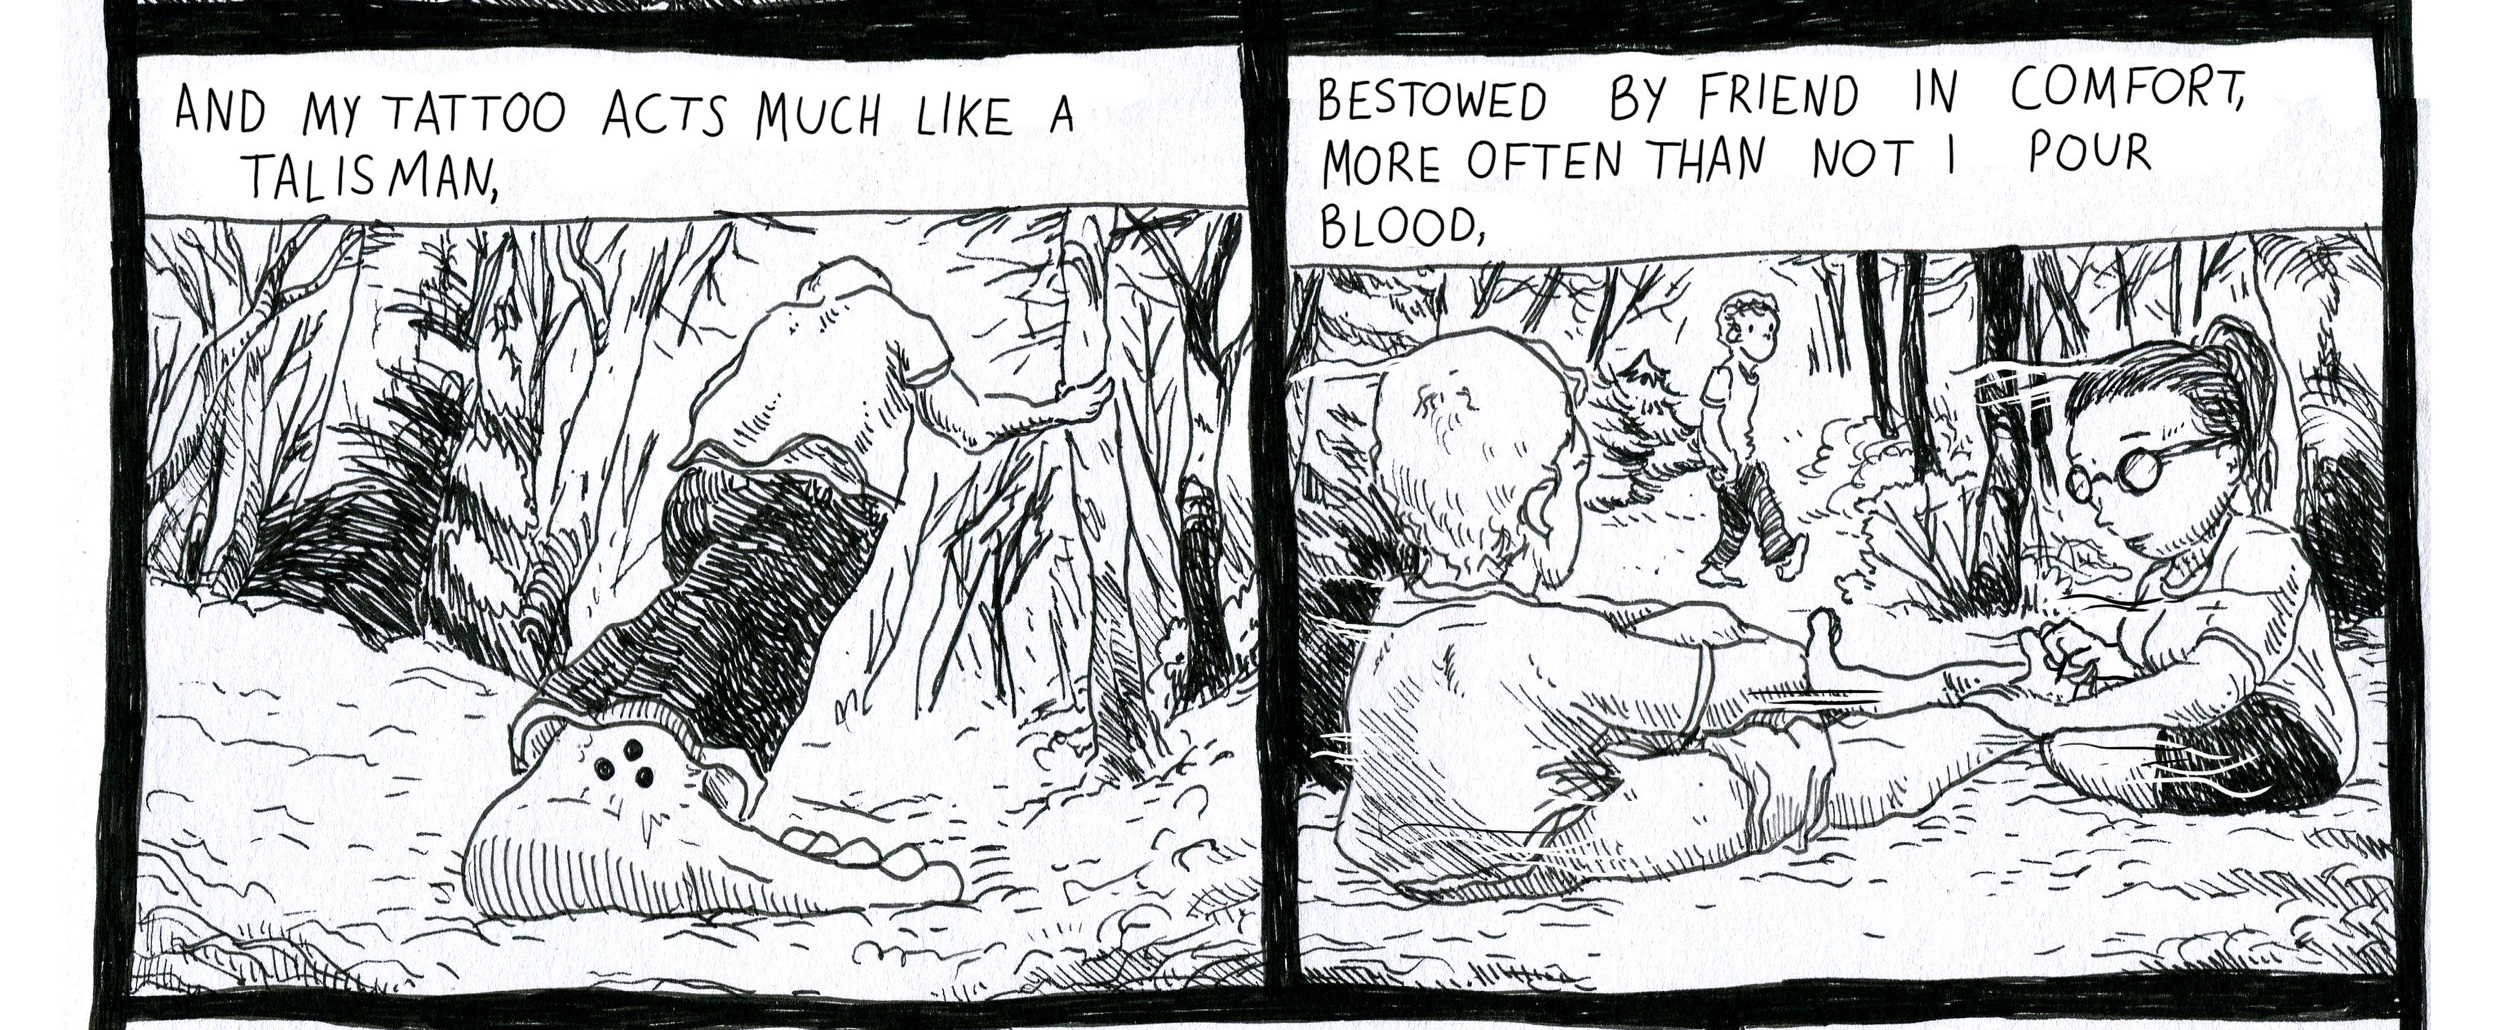 COMIC - David C. Mahler - fingernail blood (page 1).jpg